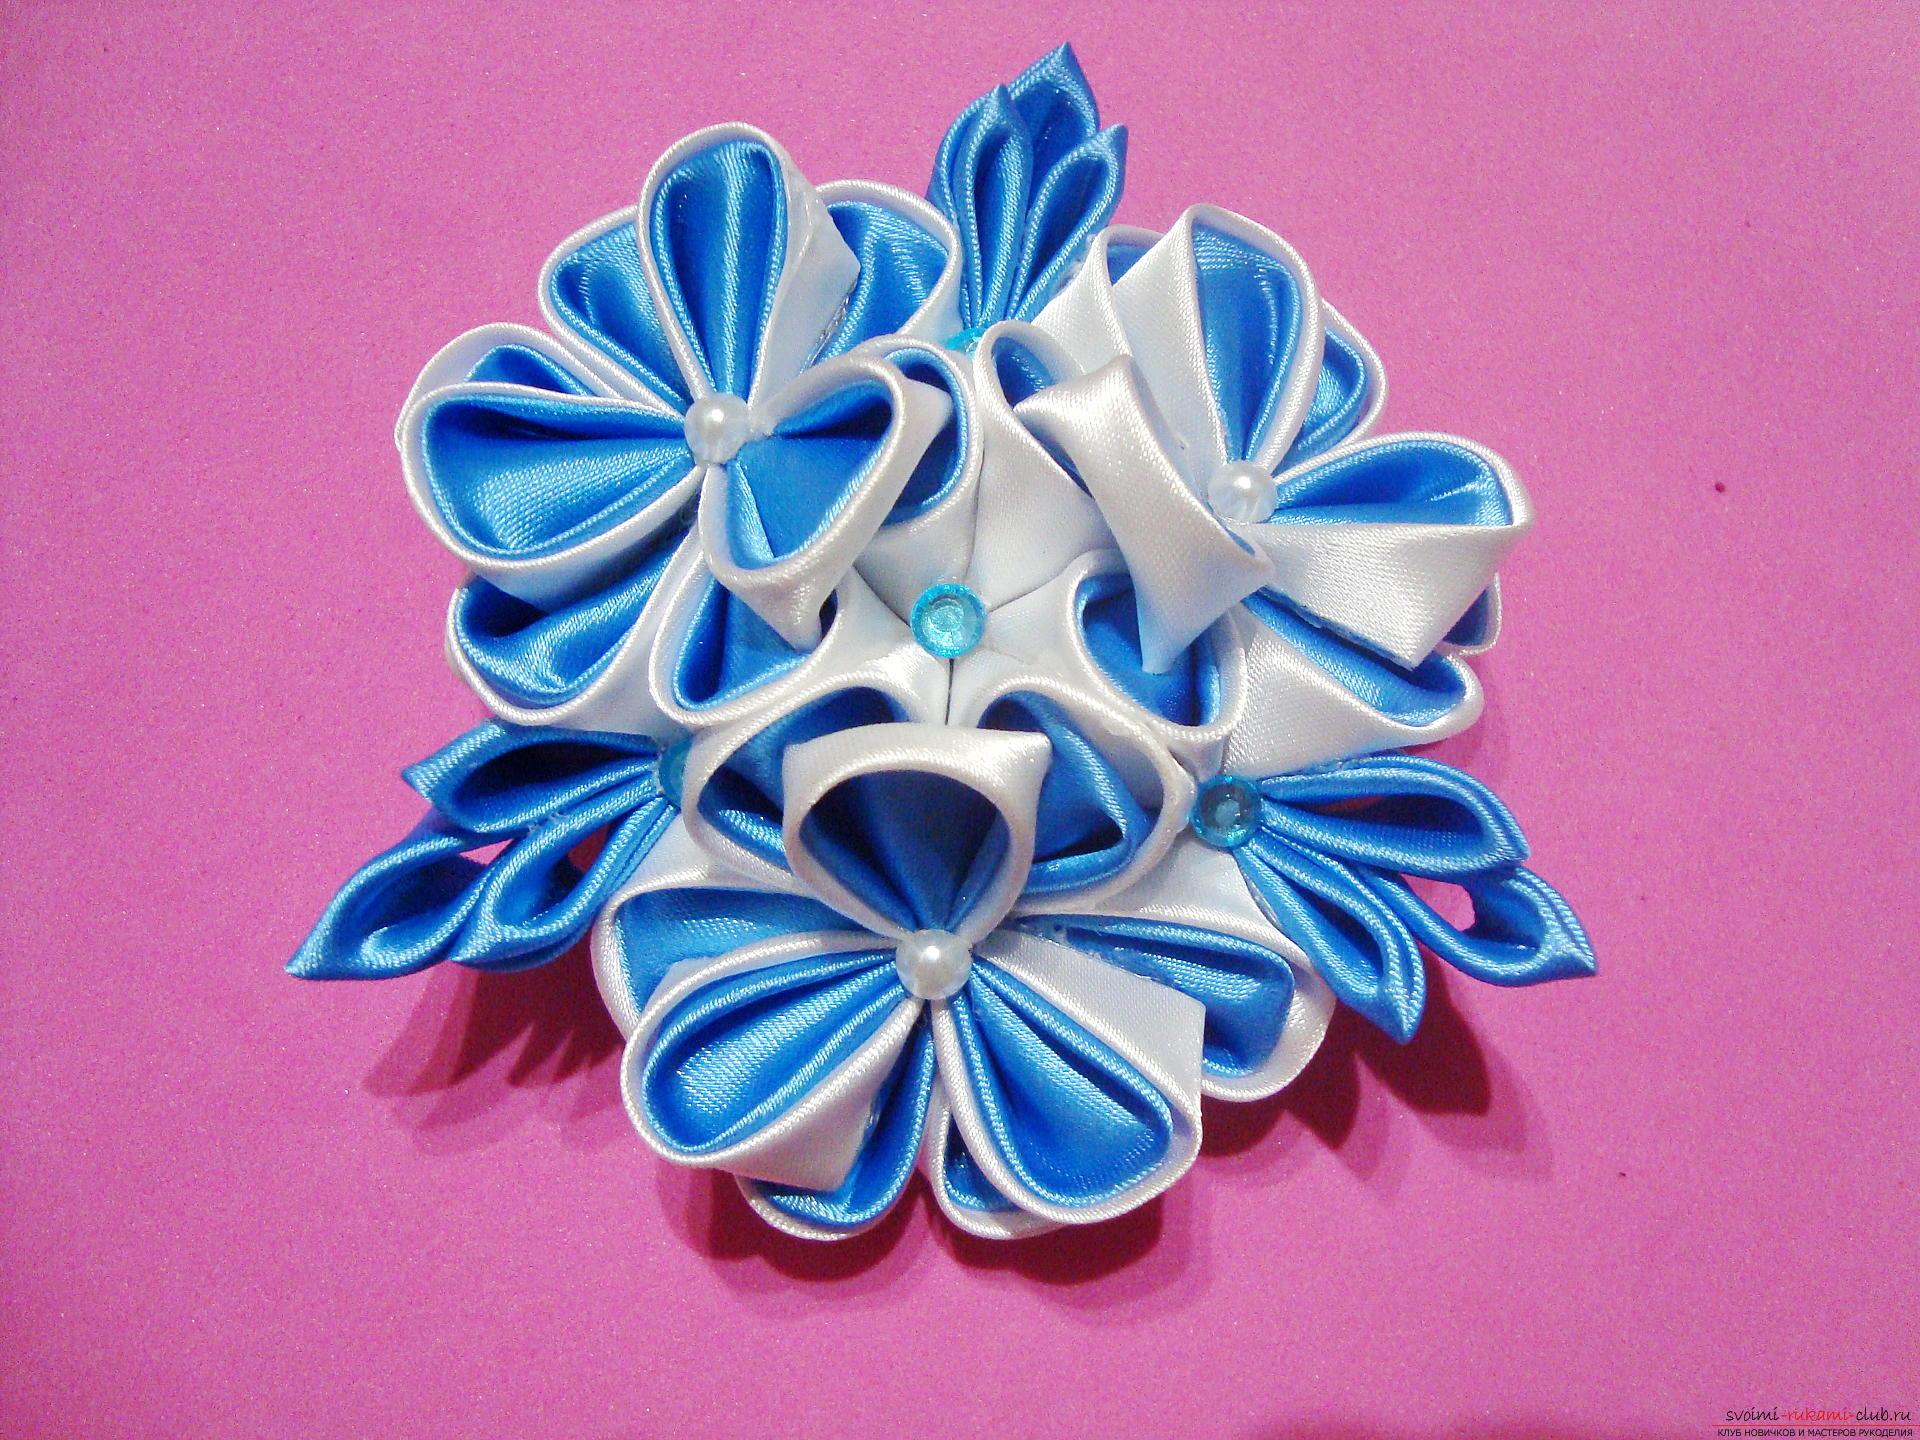 Фото инструкция по изготовлению заколки из лент голубого цвета в технике канзаши. Фото №14